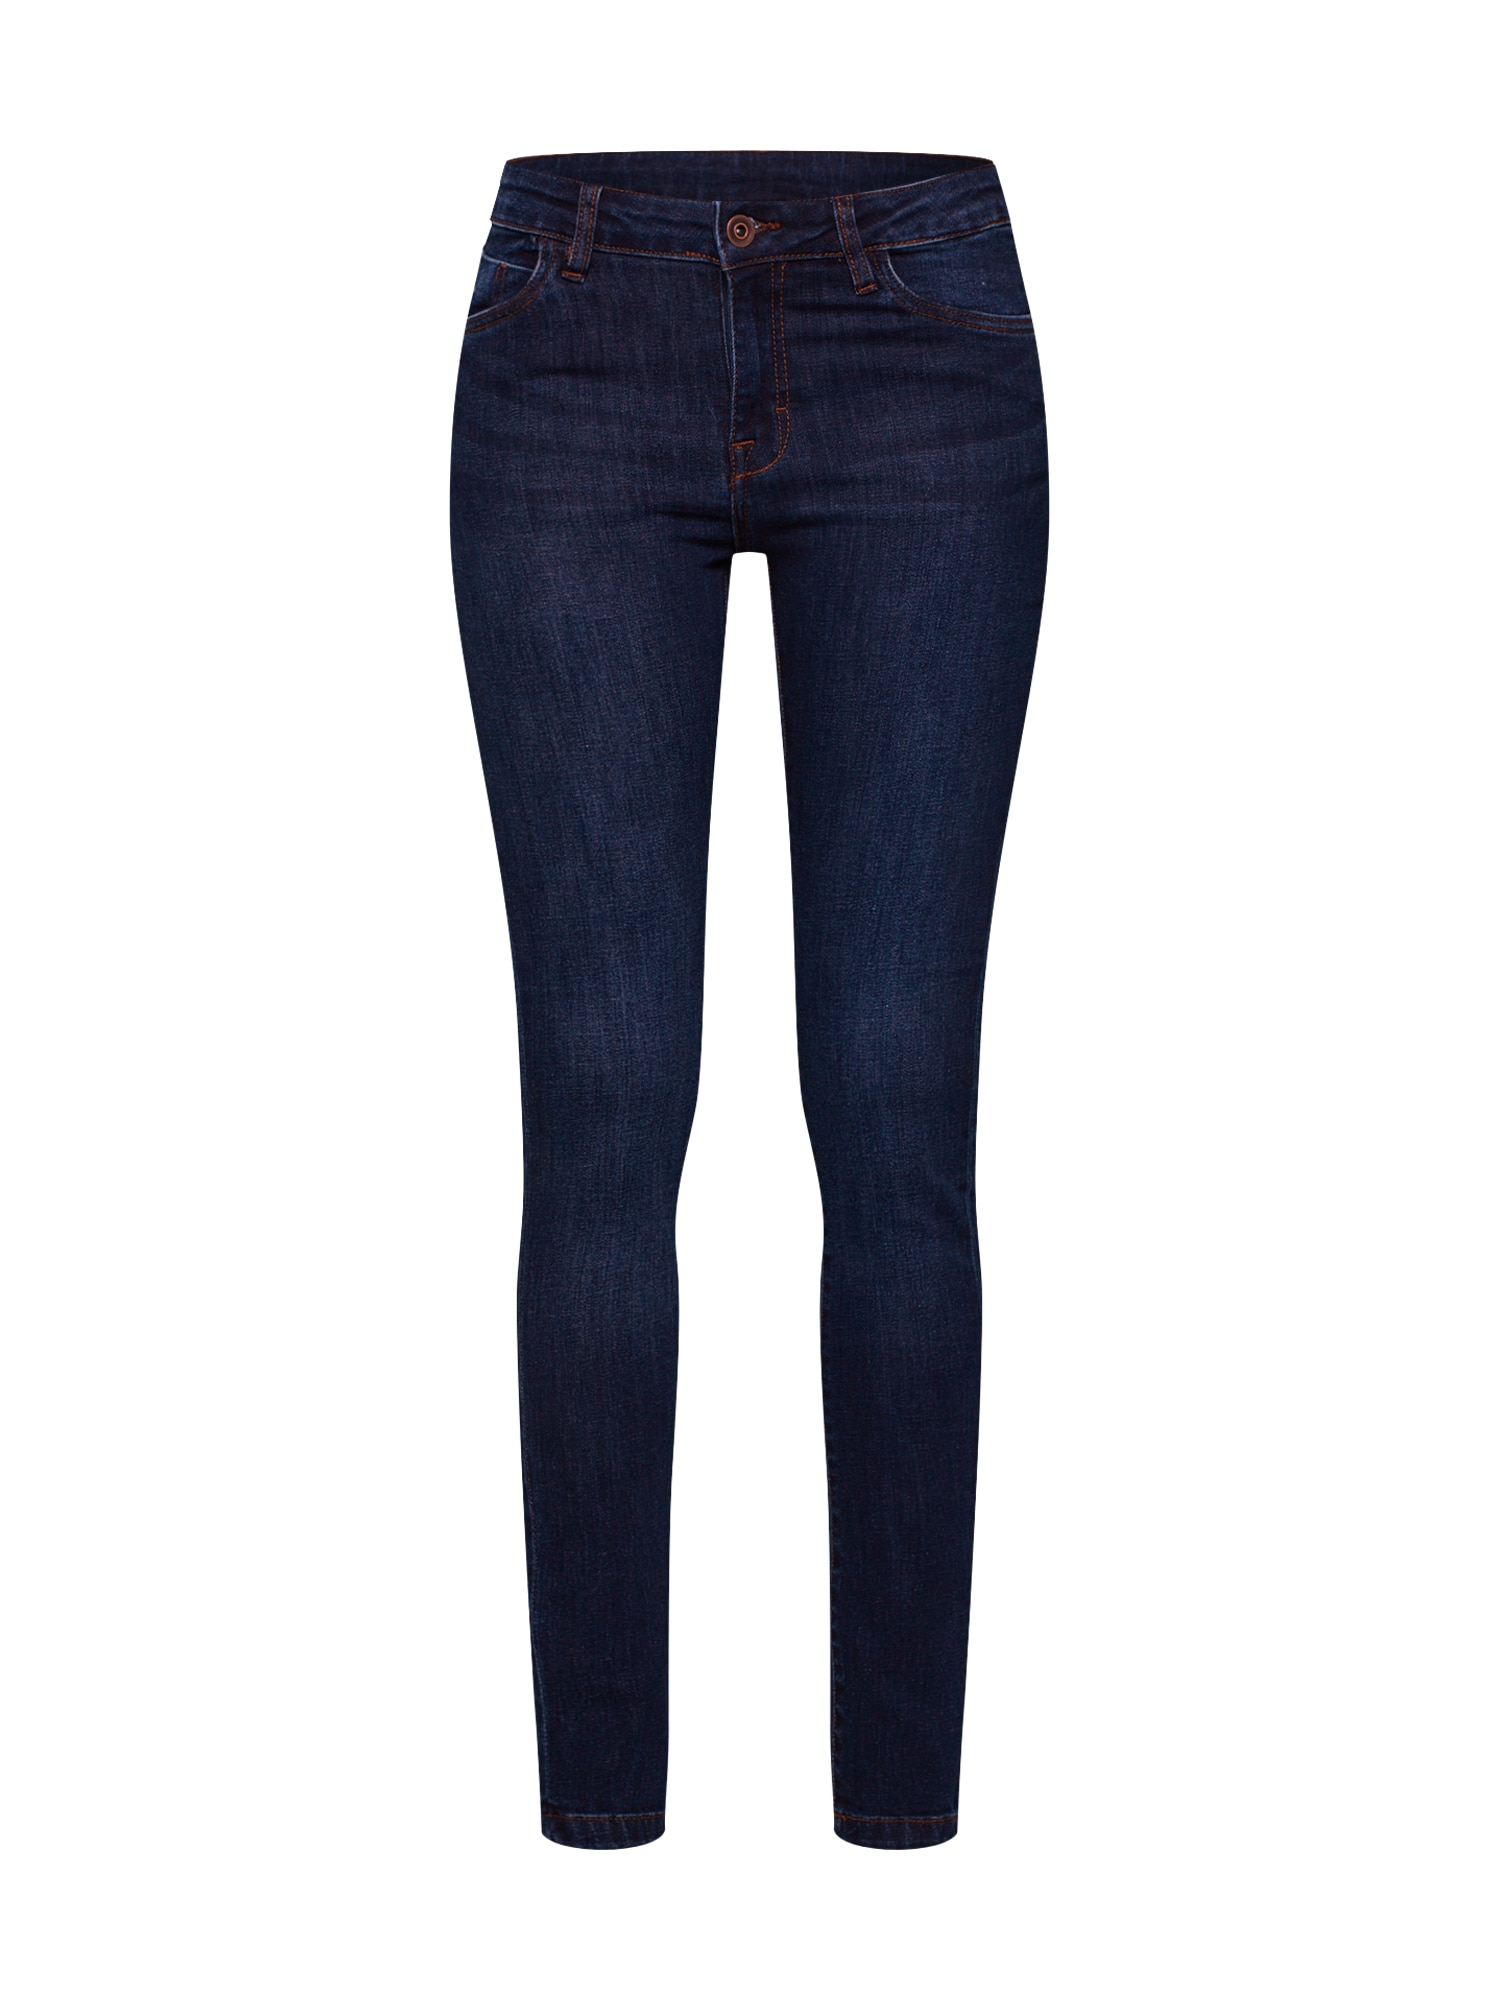 Džíny Ladies Skinny Denim Pants modrá džínovina Urban Classics